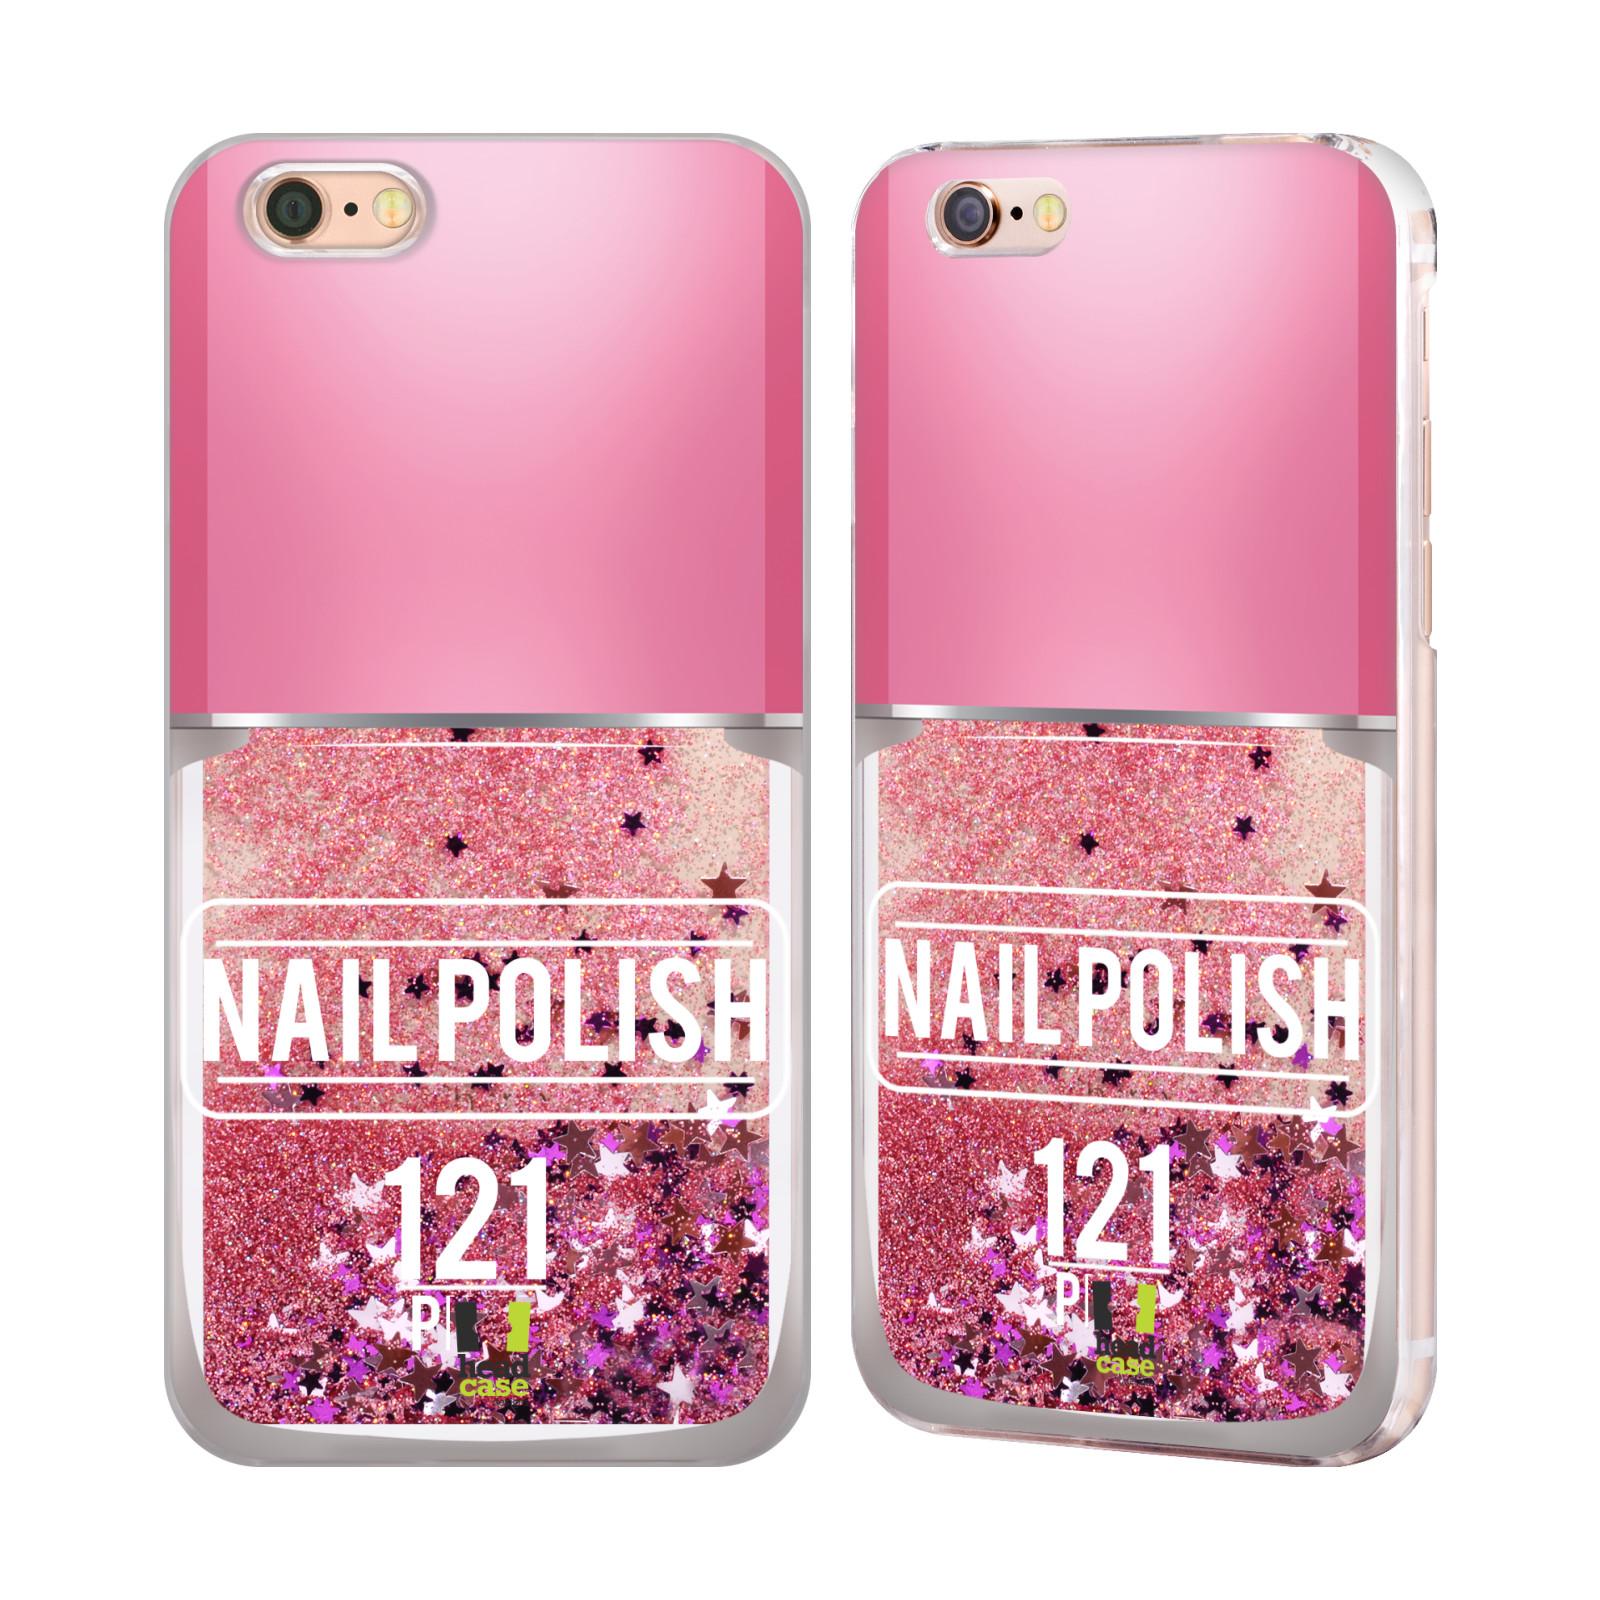 Marble Nail Polish Phone Case: HEAD CASE DESIGNS NAIL POLISH PINK GLITTER CASE FOR APPLE